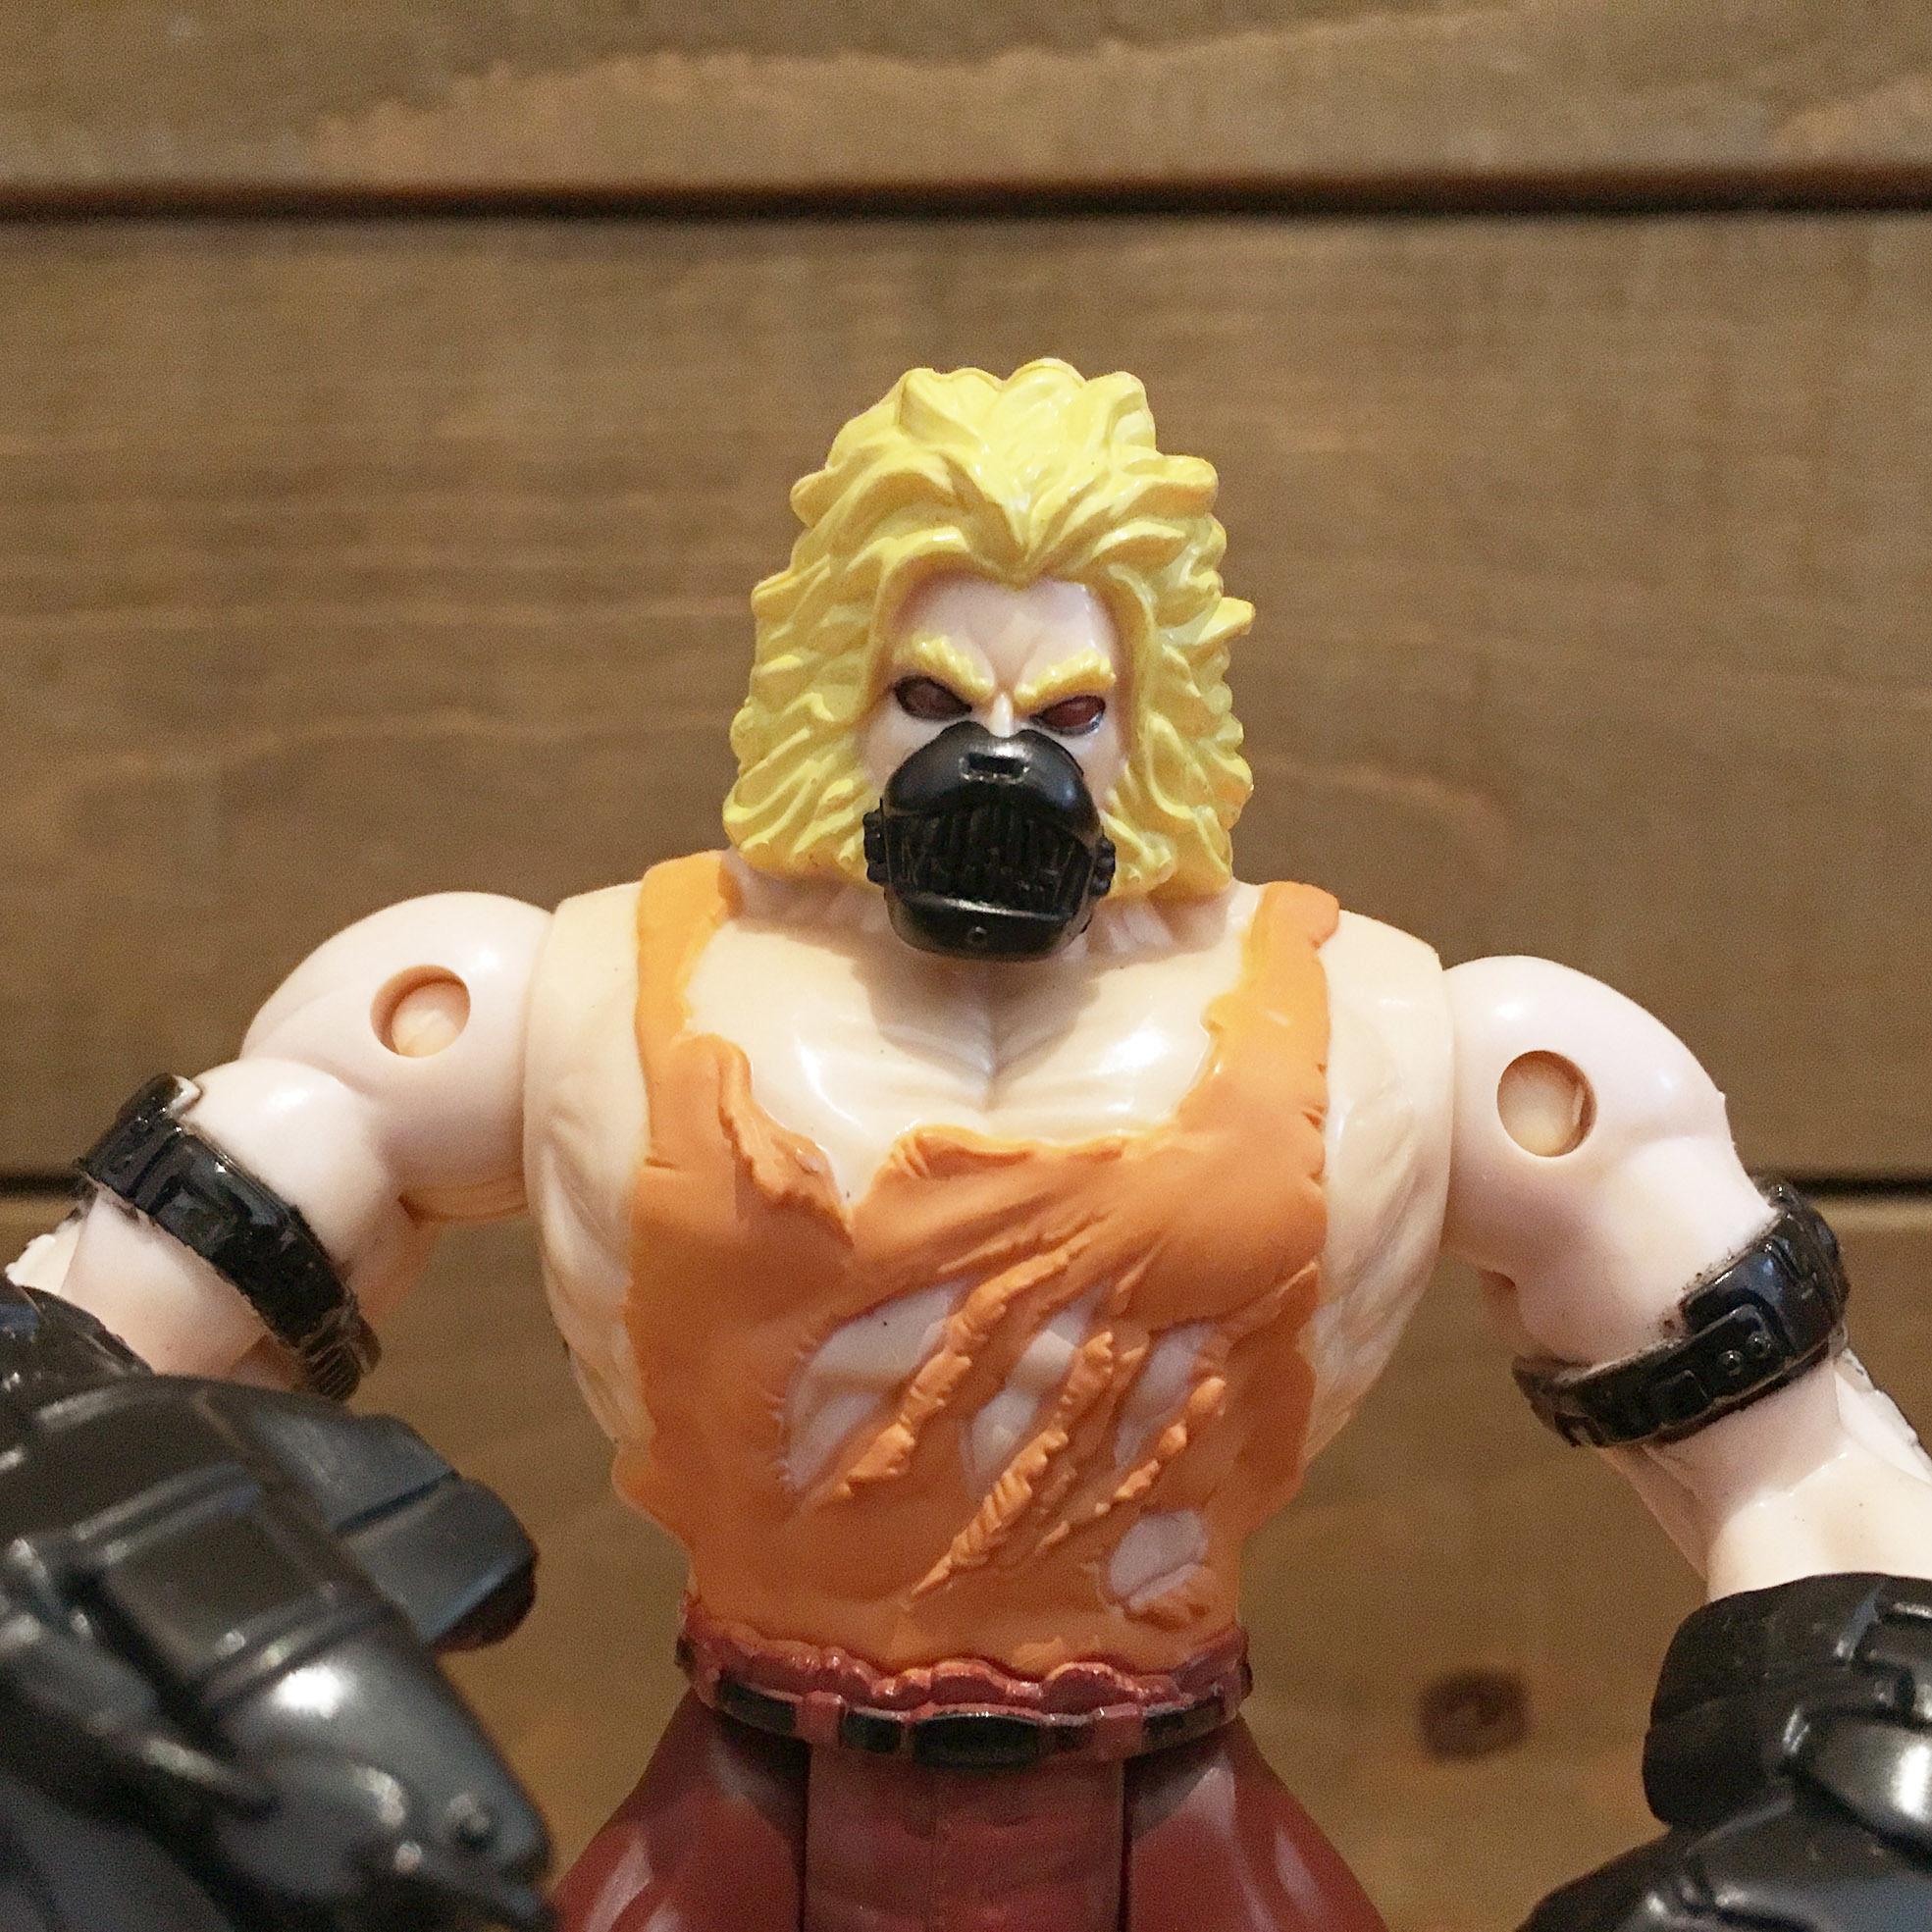 X-MEN Sabretooth Figure/X-MEN セイバートゥース フィギュア/180425-5